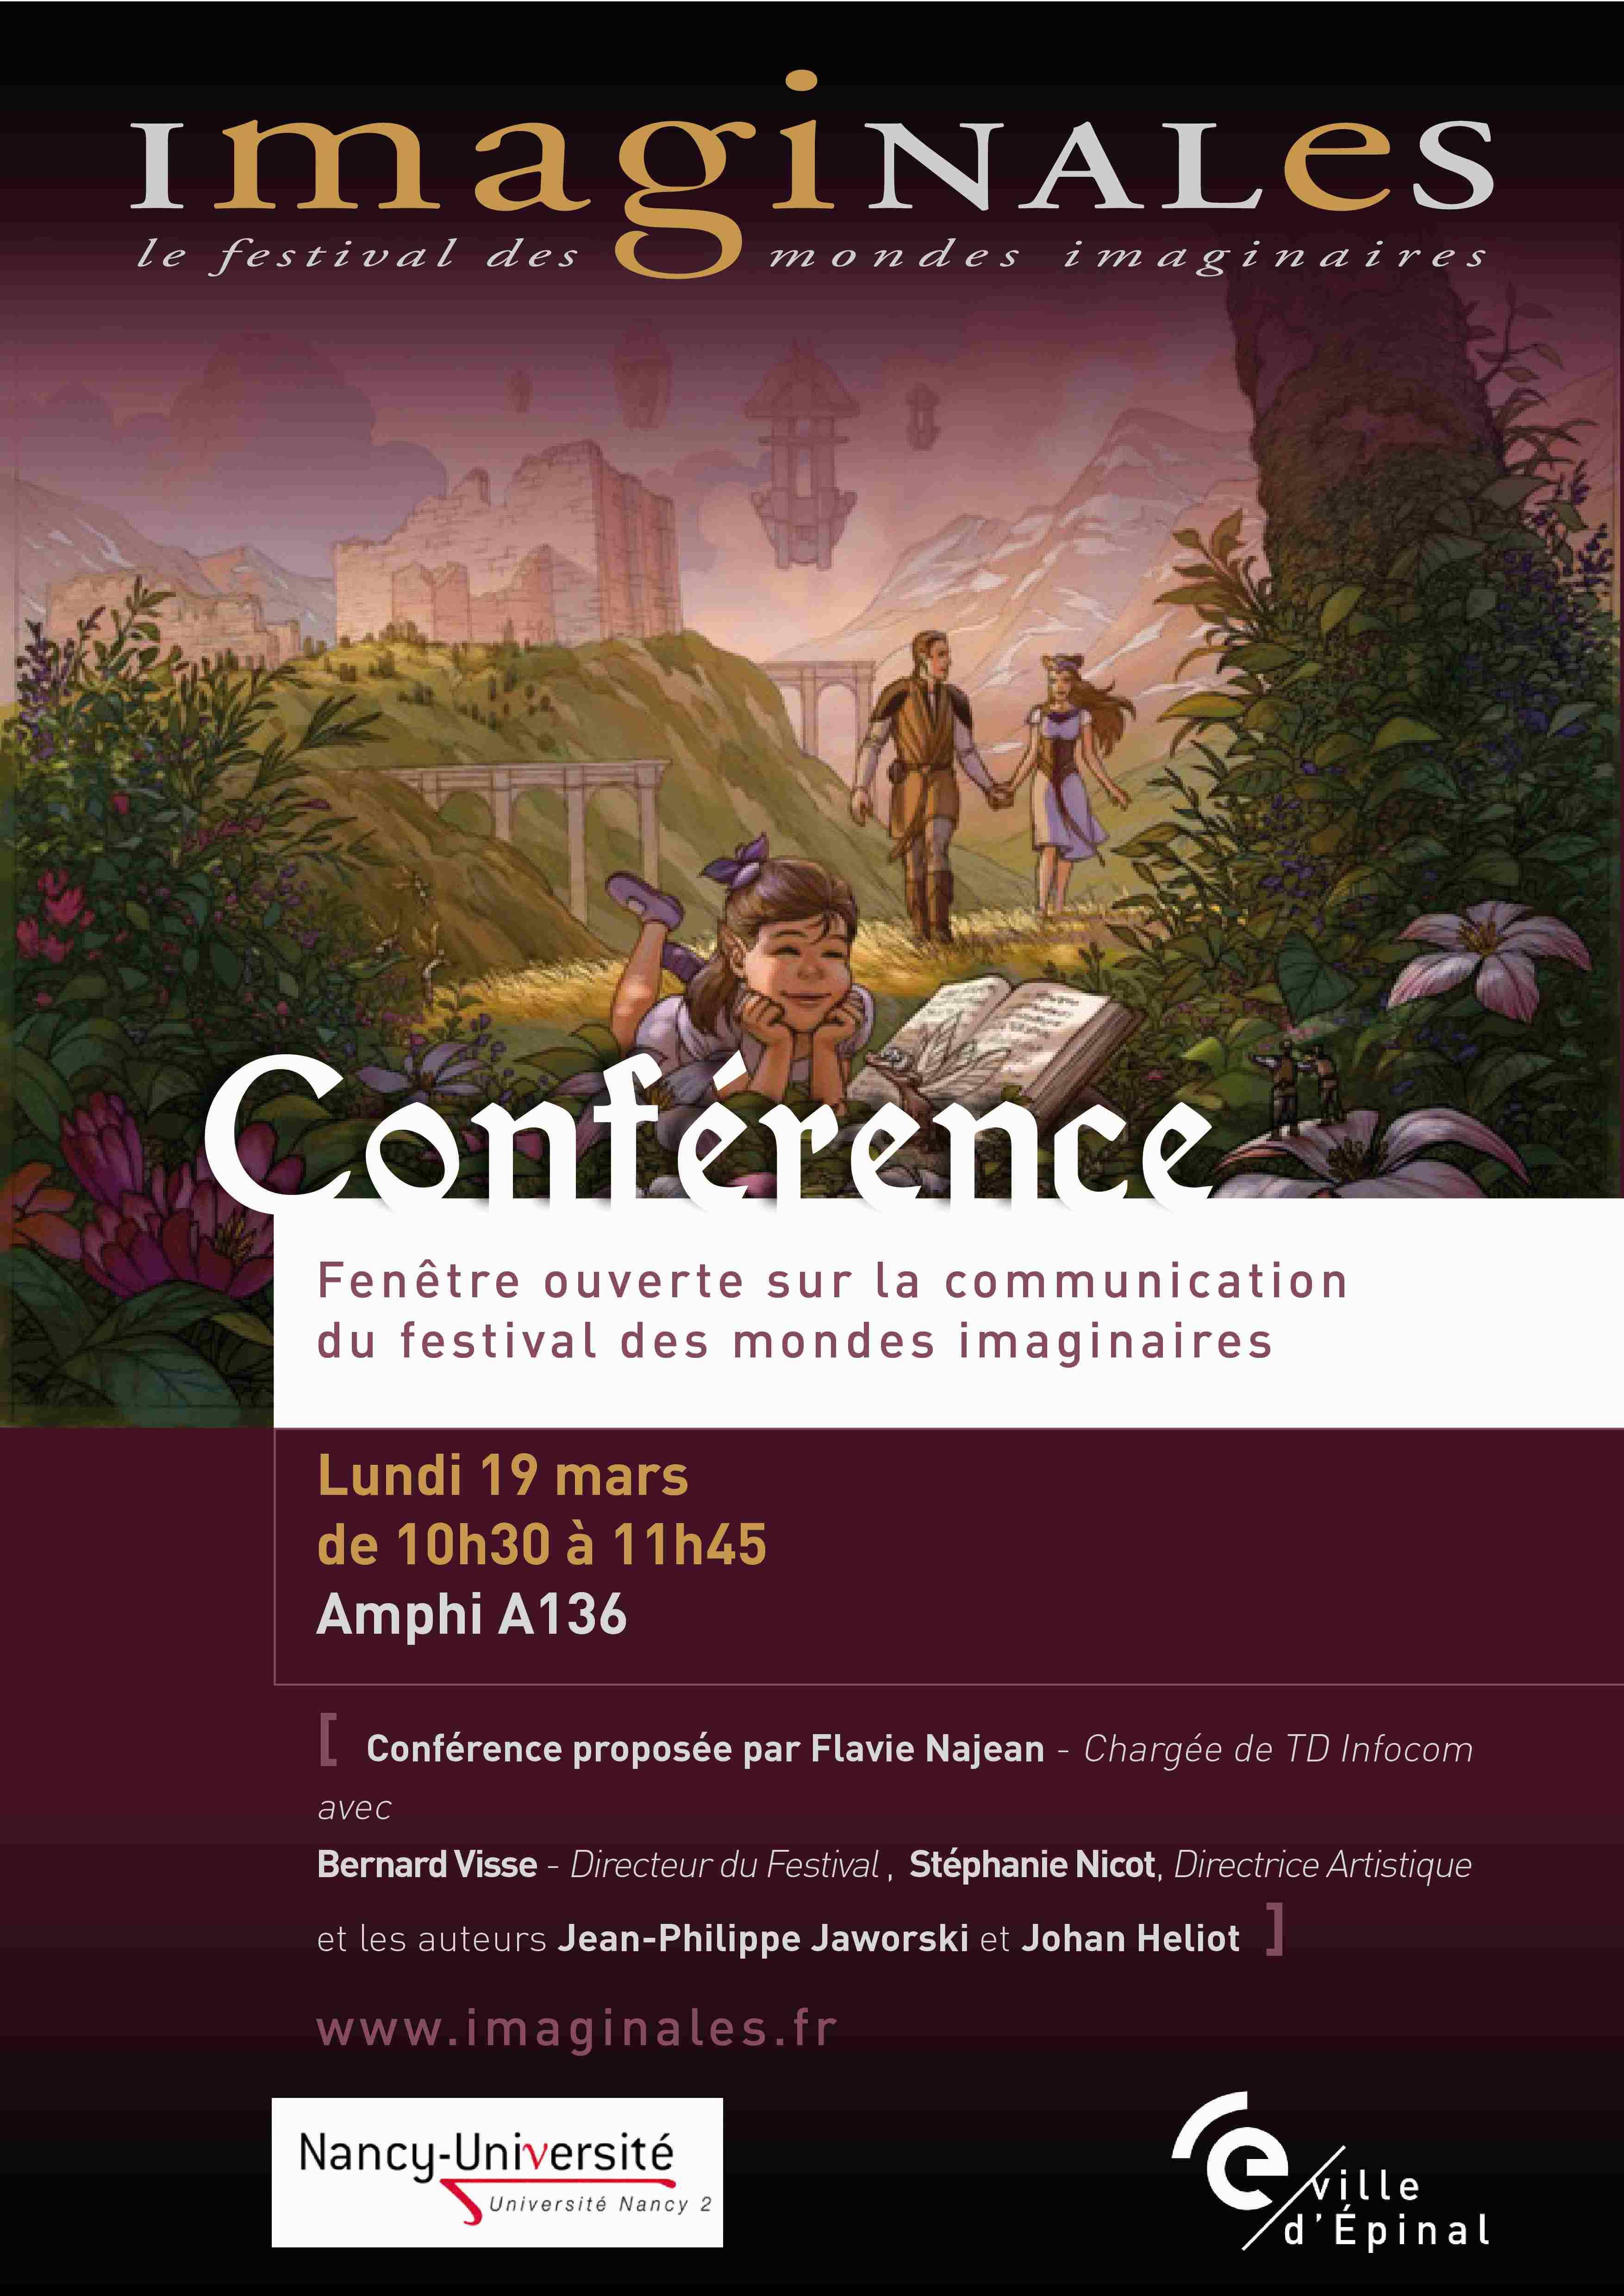 Programme contes et rencontres nyons 2017